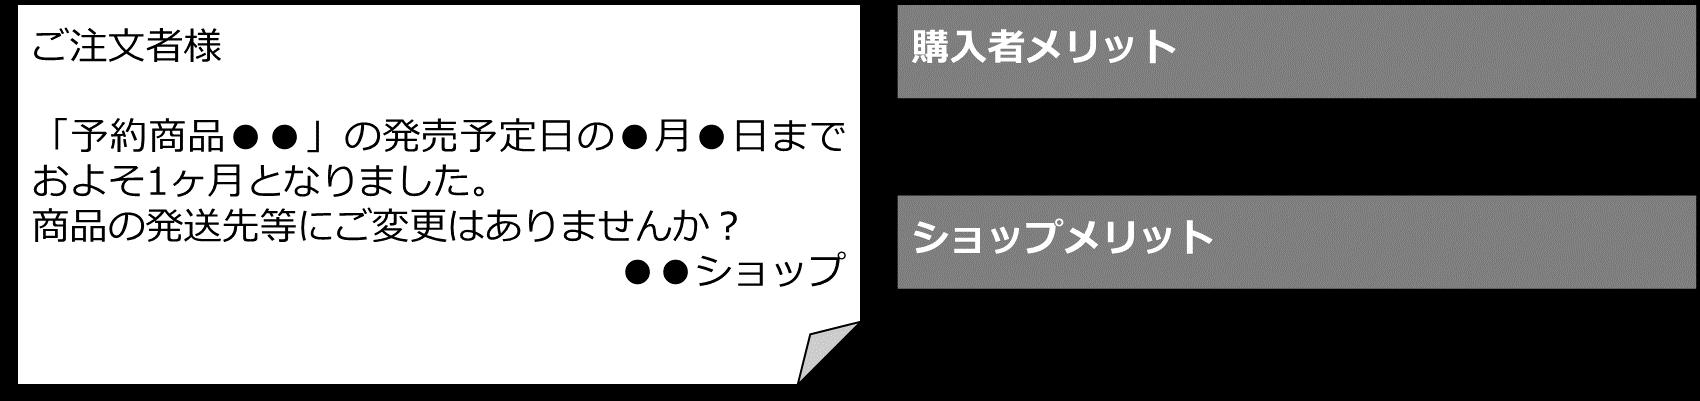 160808-2